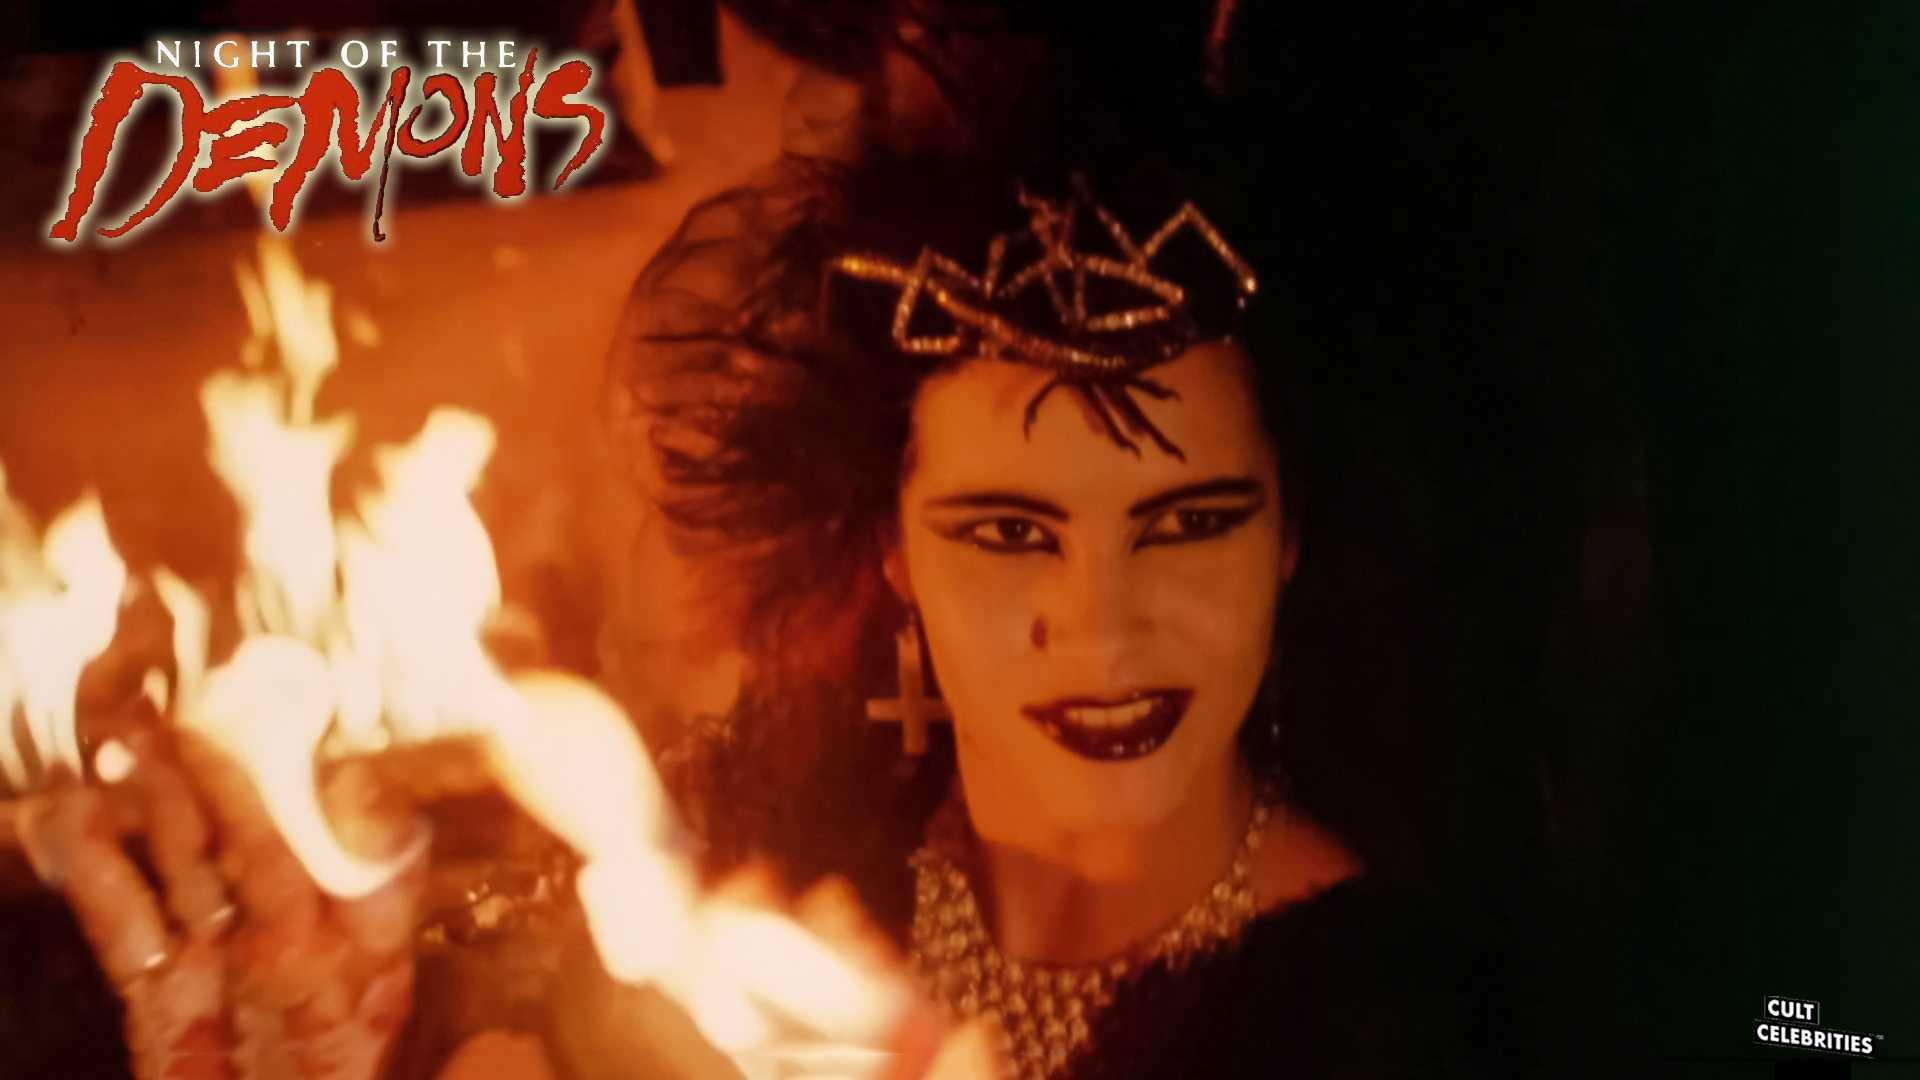 Amelia Kinkade in Night of the Demons (1988)